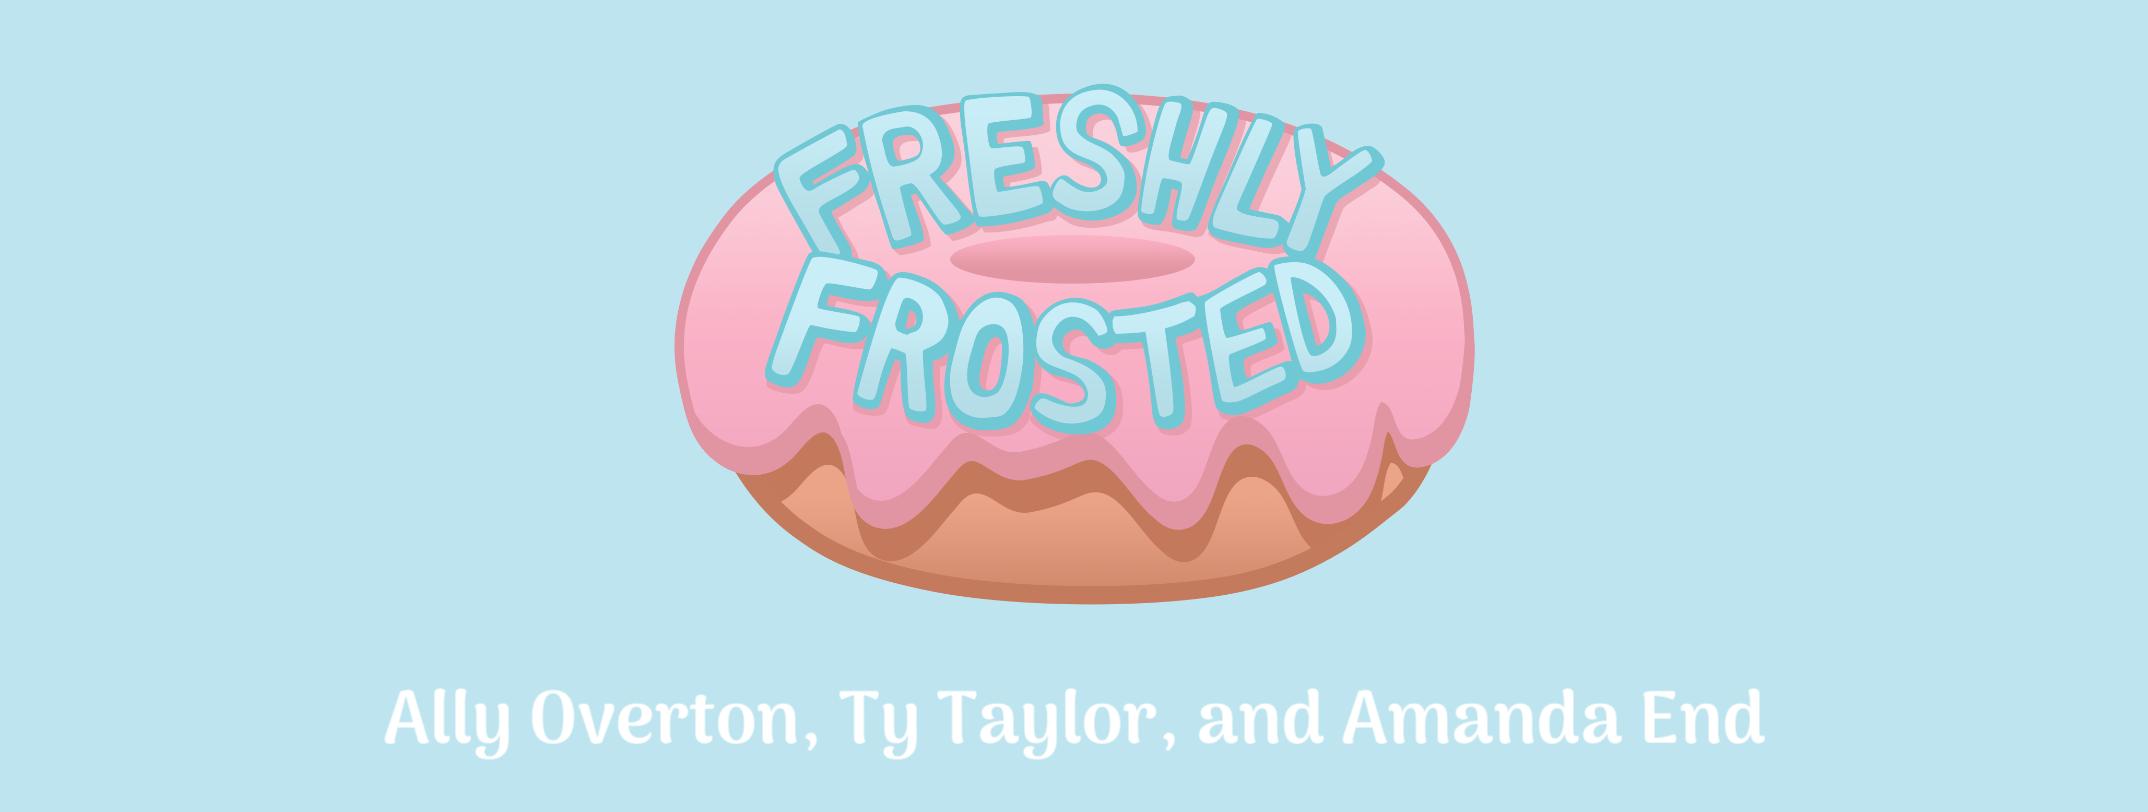 FreshlyFrosted00.png